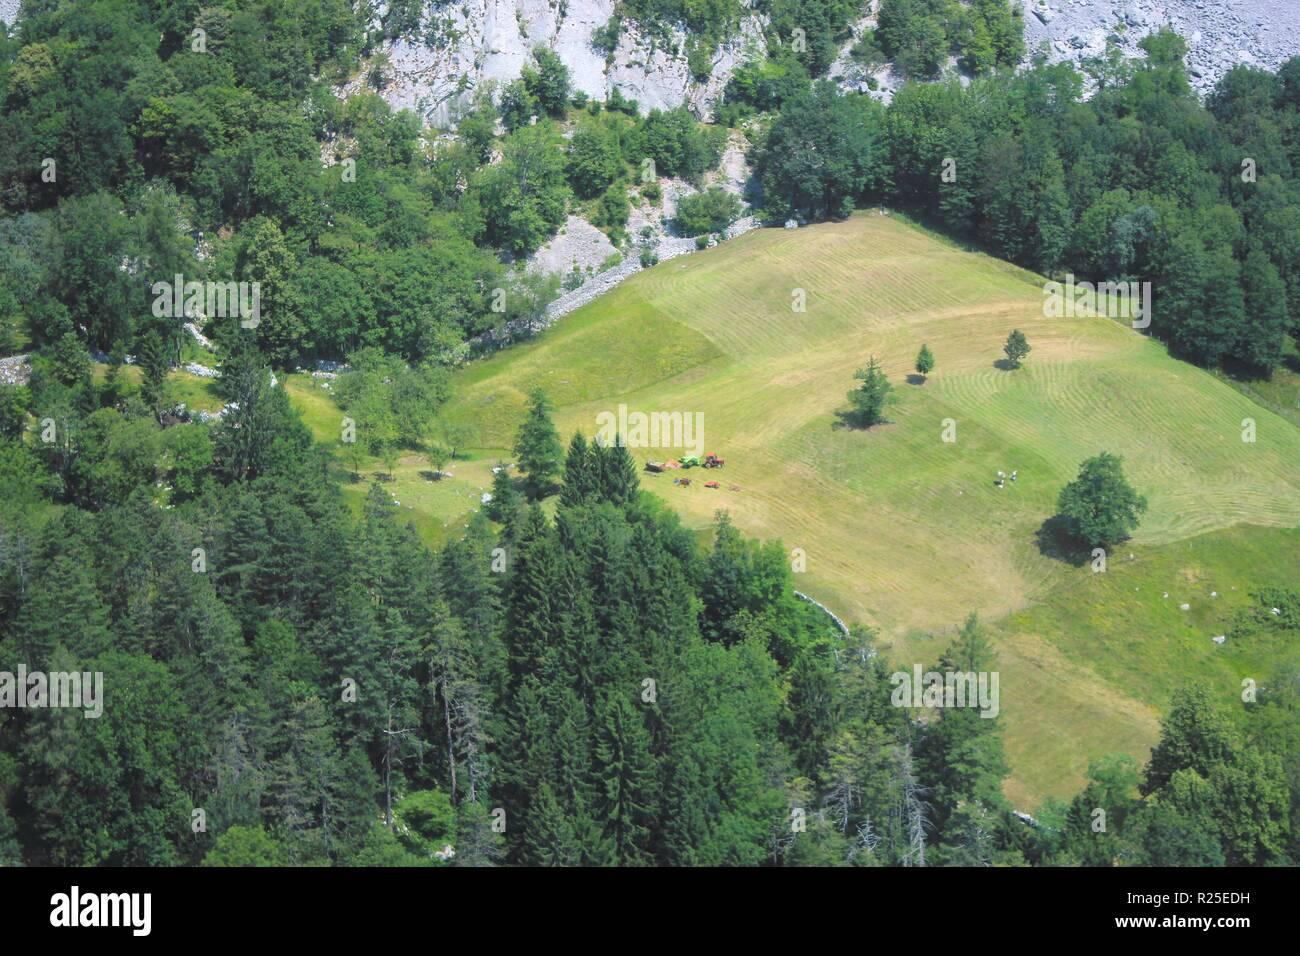 Green alpine pasture landscape, Julian Alps, Soca river valley, Alpe Adria trail, Slovenia, central Europe - Stock Image